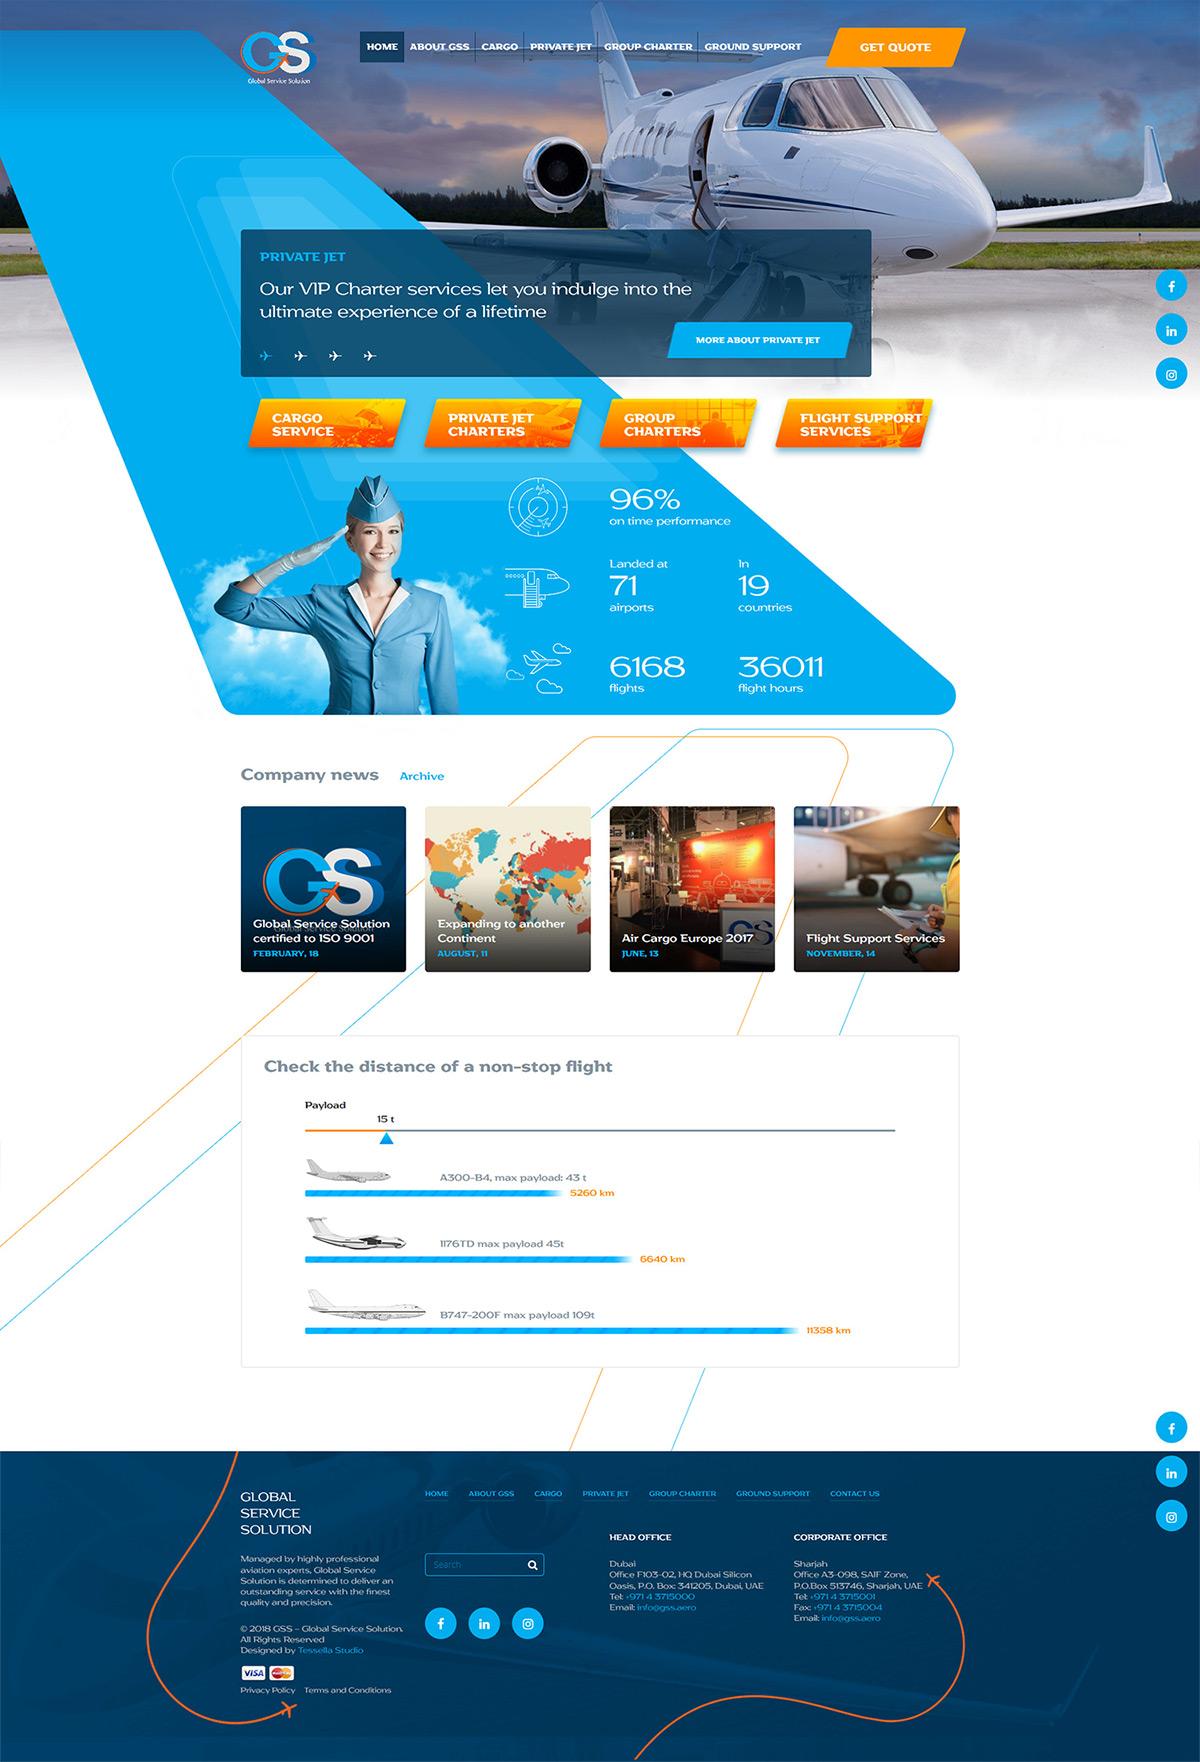 Gss.aero Main Page